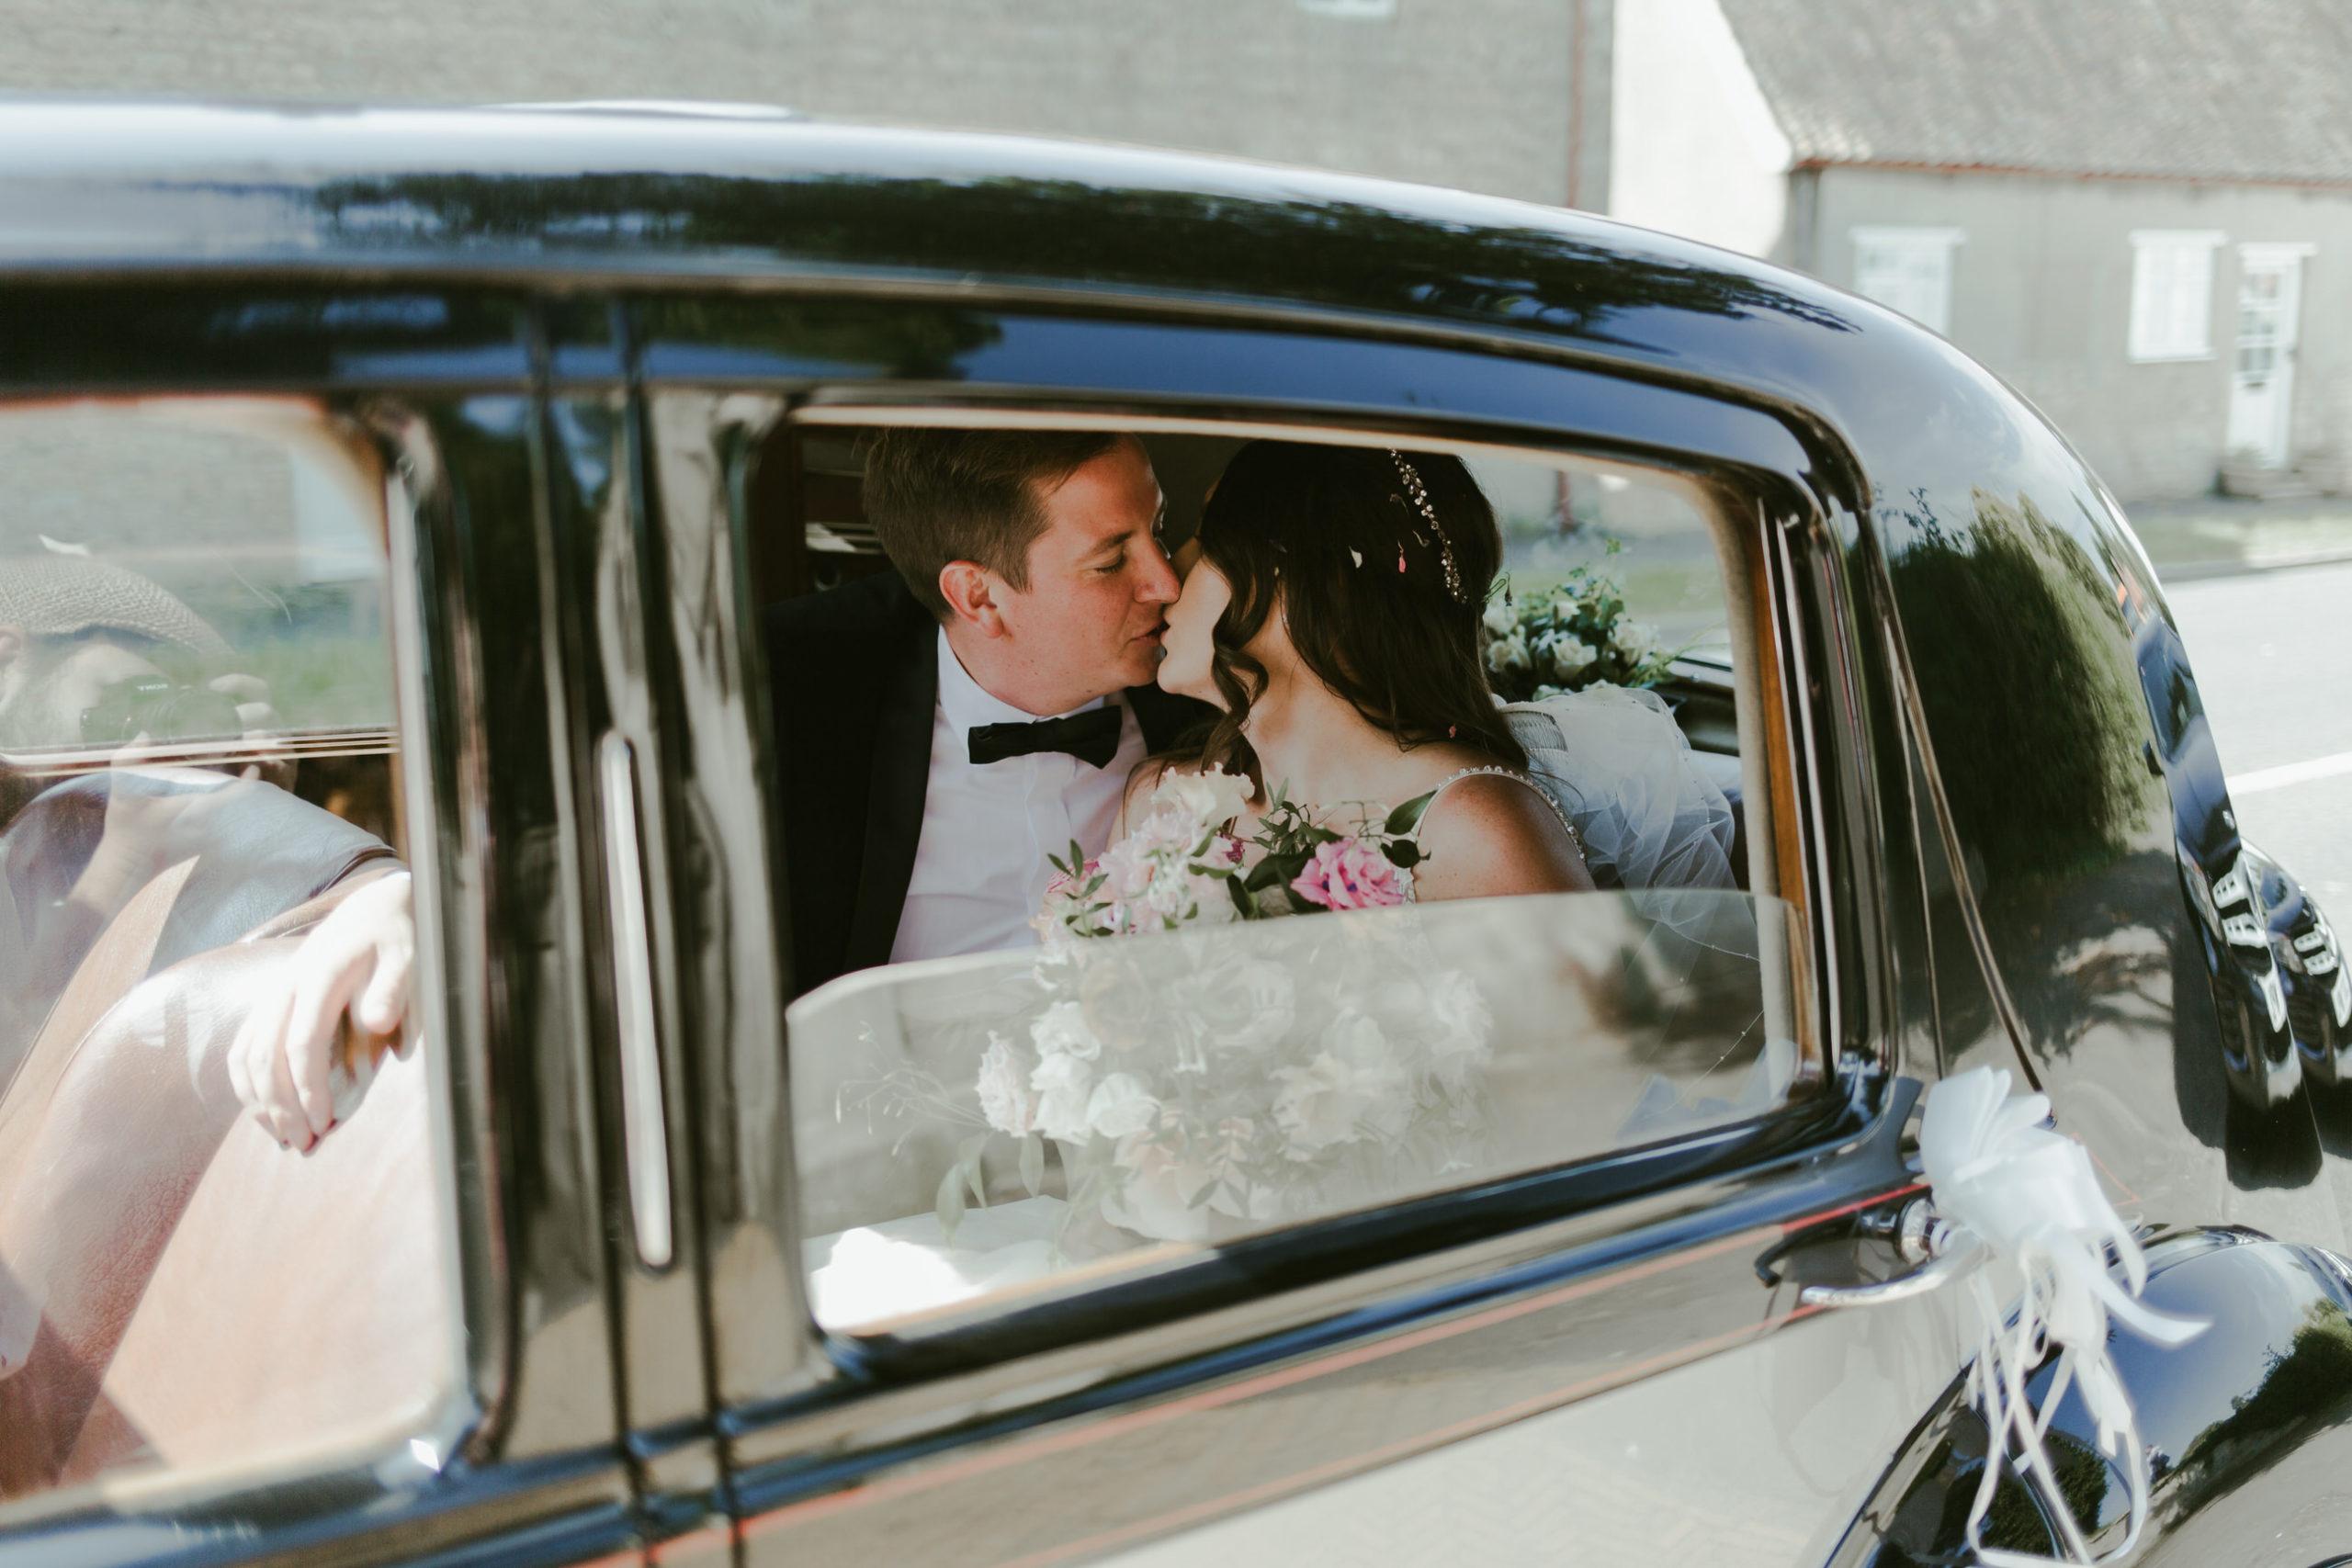 wedding car church ceremony bride and groom